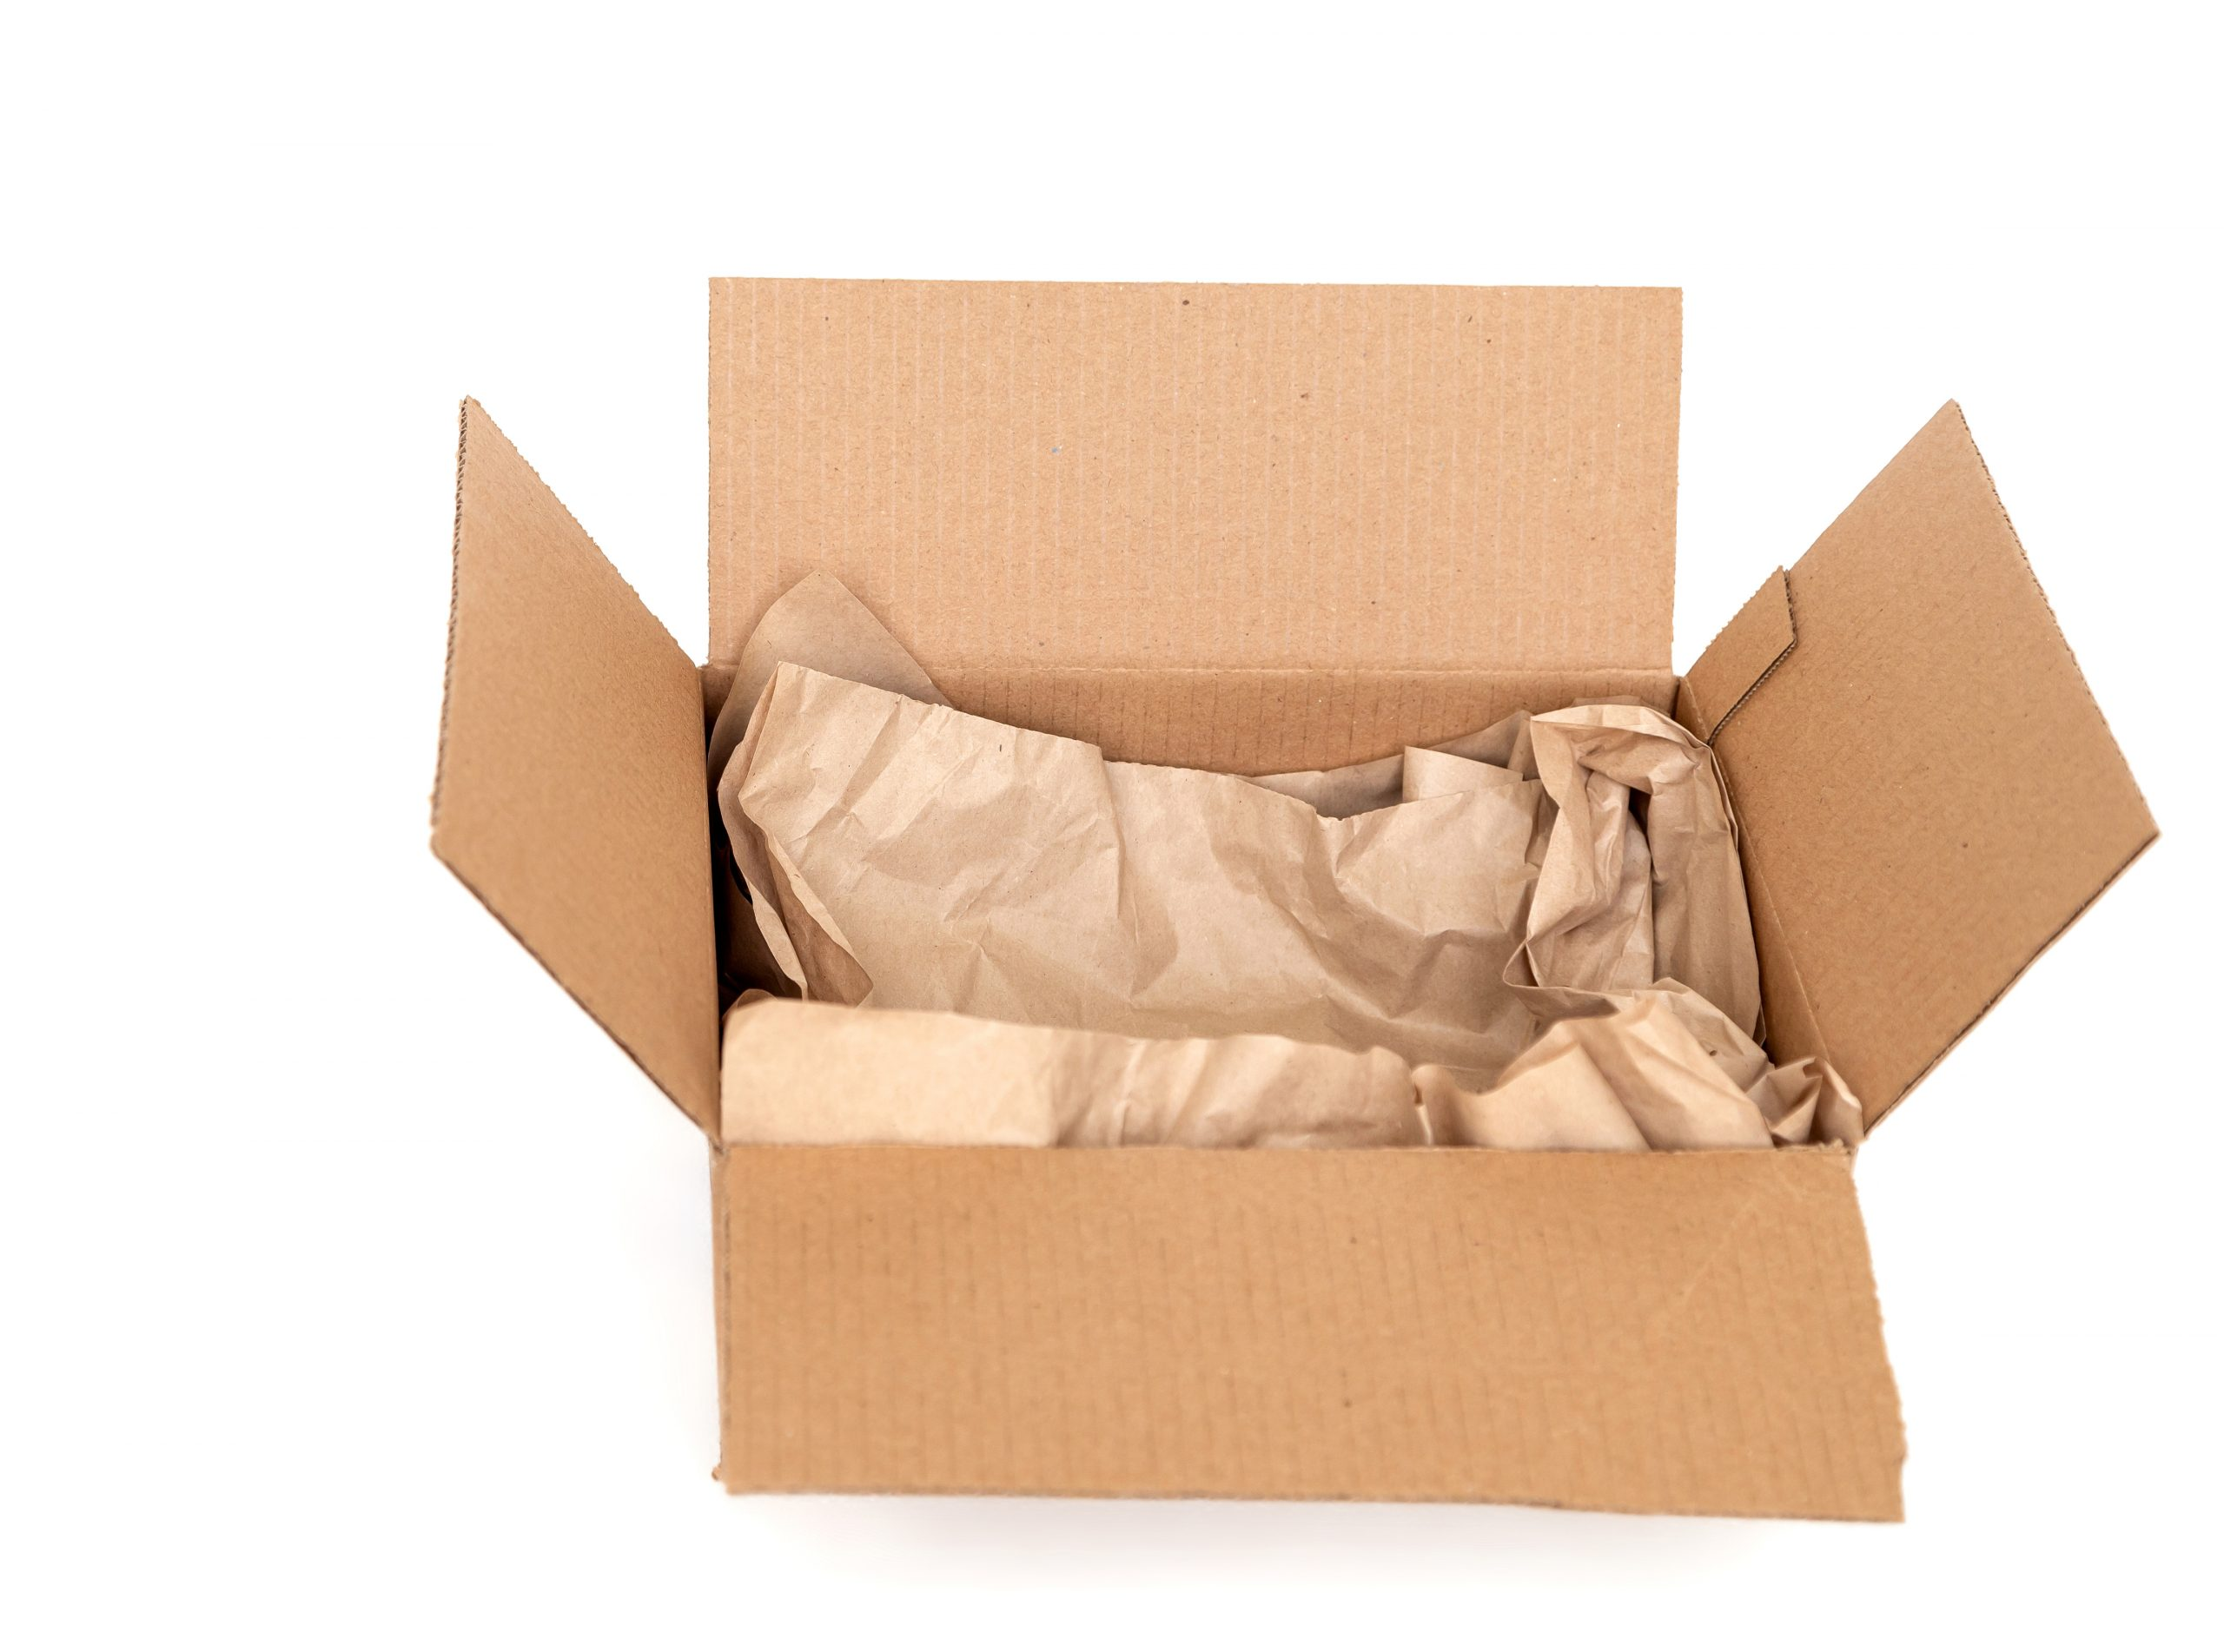 Amazon Counterfeit Products